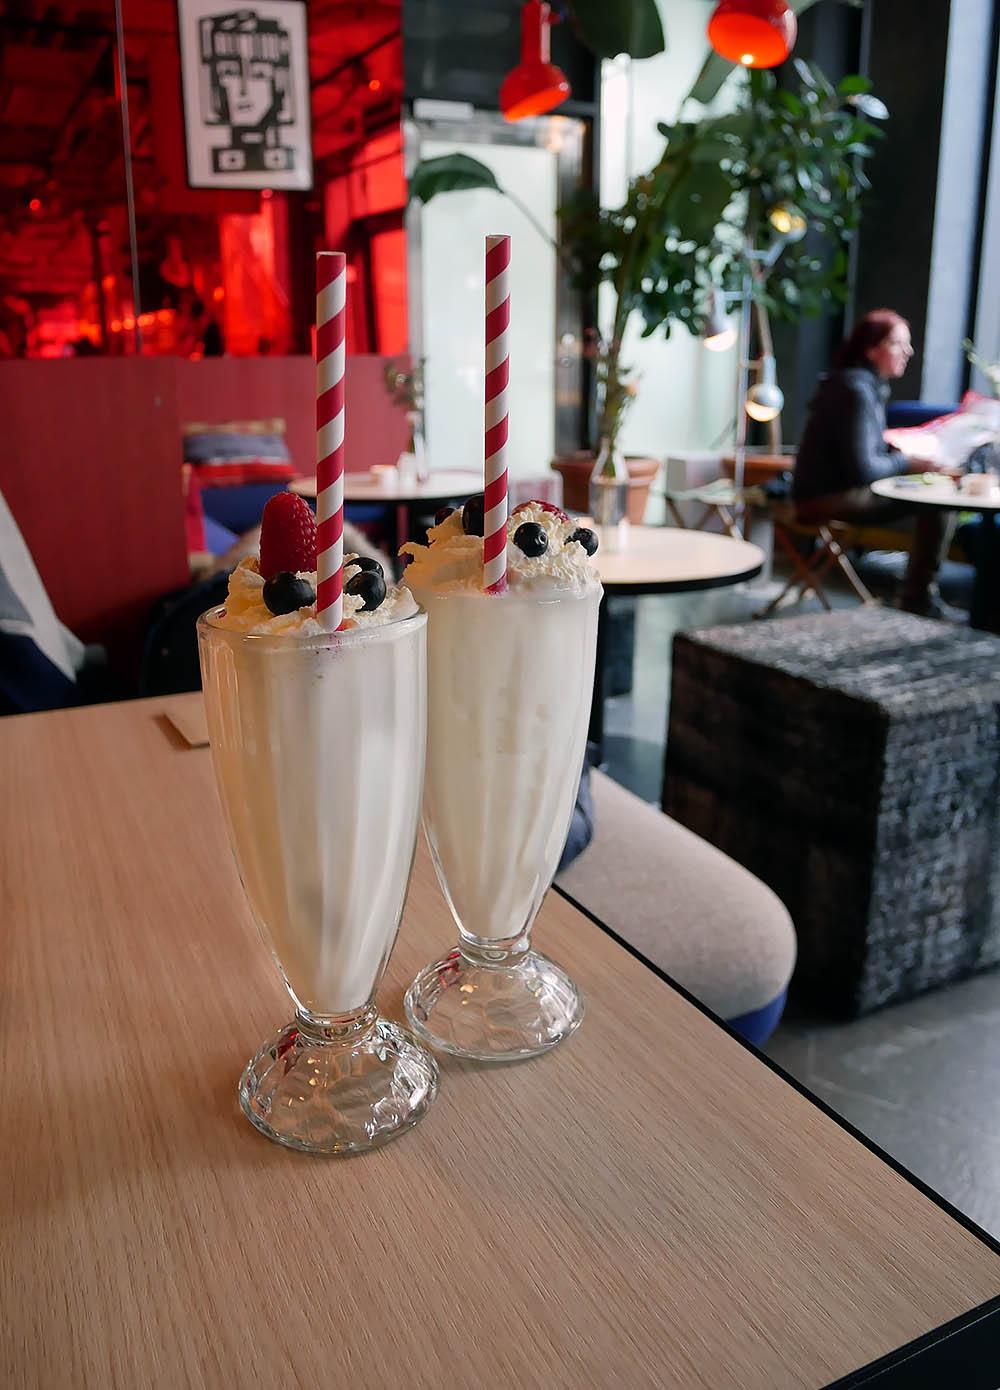 milkshake2.jpg